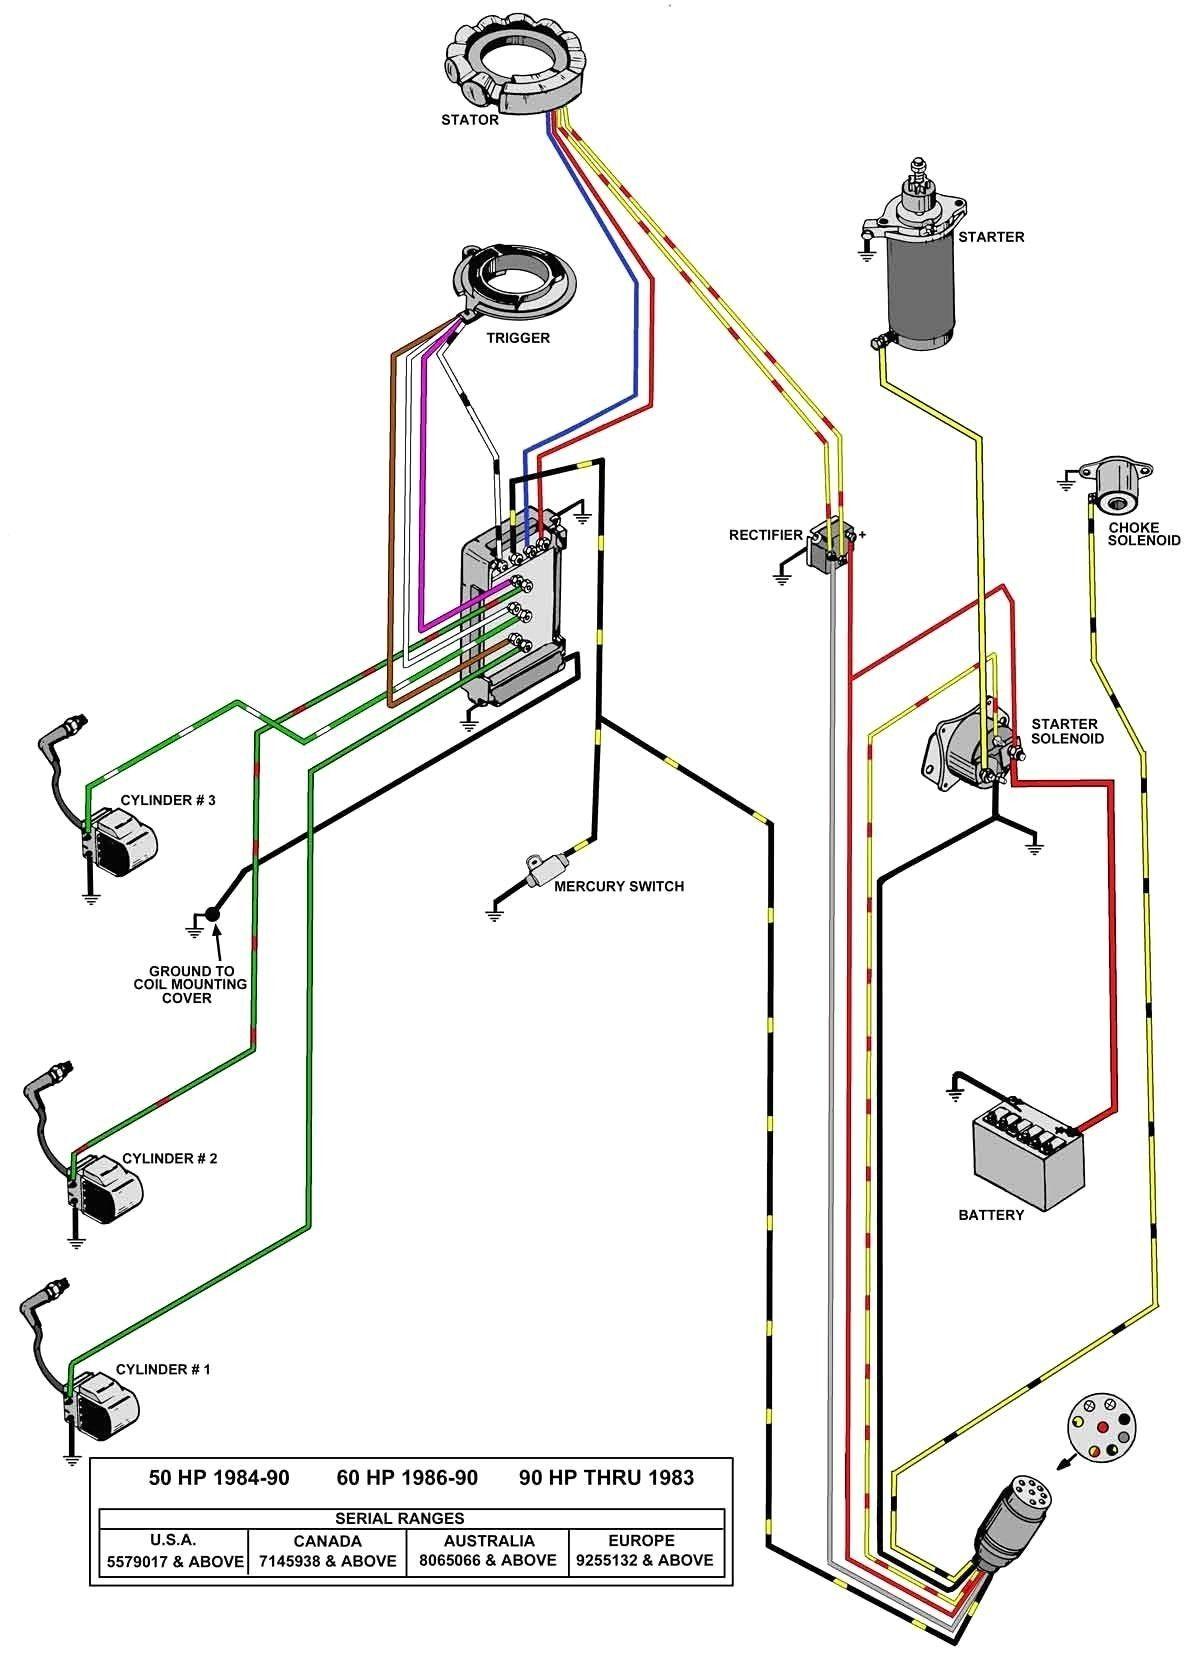 Automotive Ignition Wiring Diagram Diagram Diagramtemplate Diagramsample Mercury Outboard Diagram Outboard